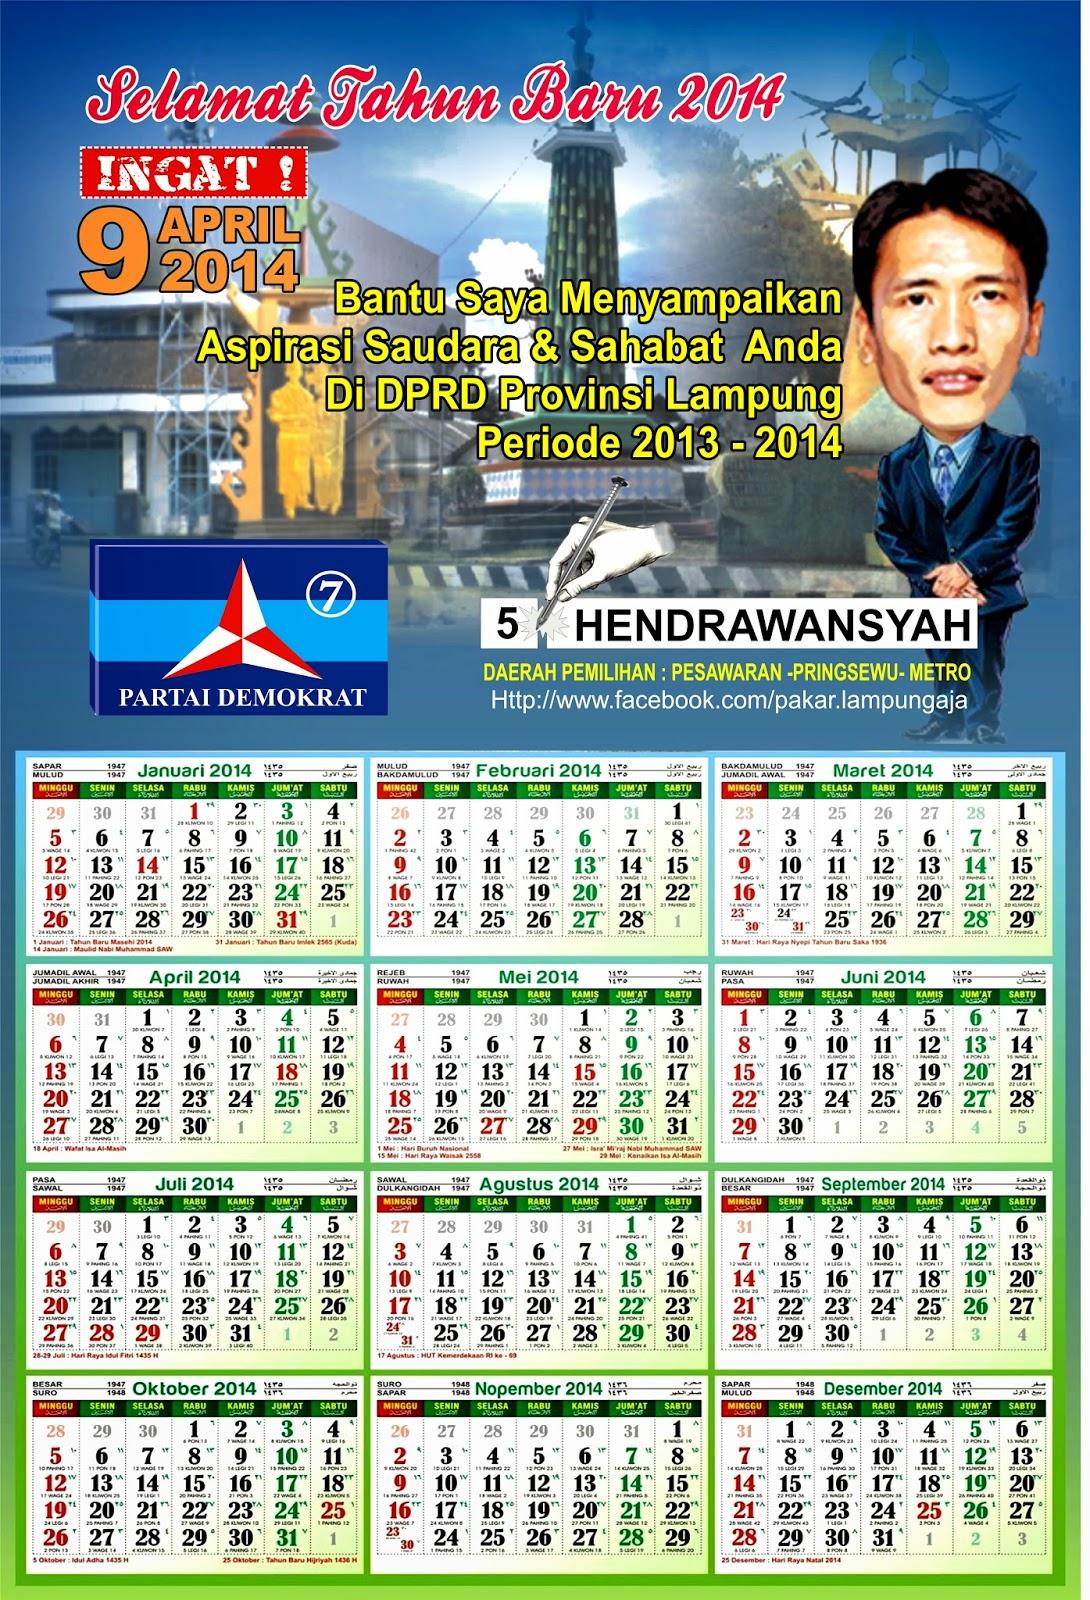 Cetak Kalender Caleg 2014 Murah Harga Murah